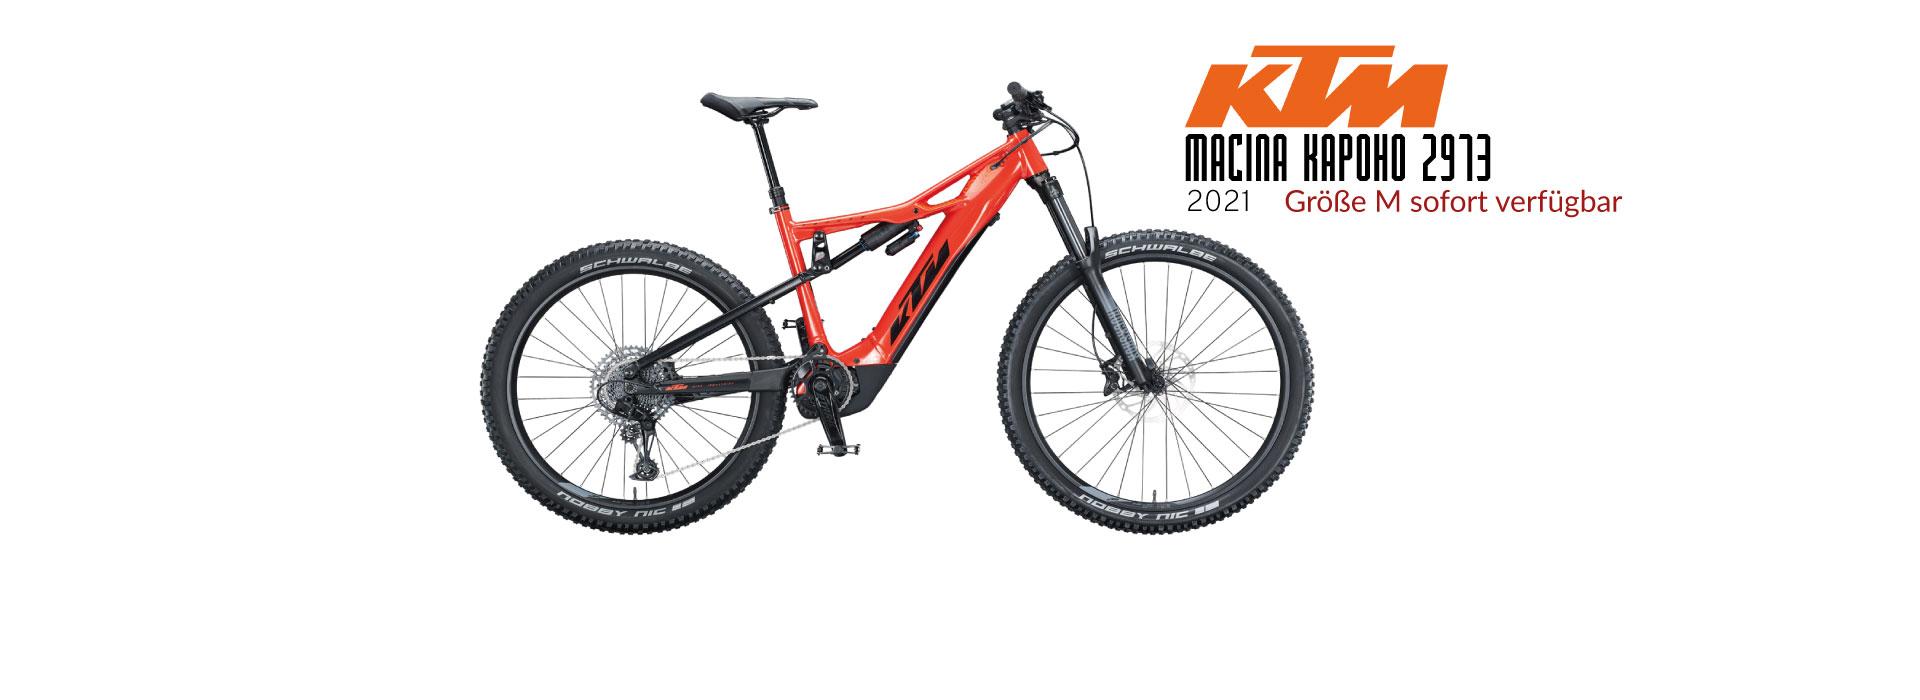 Macina-Kapoho-2973